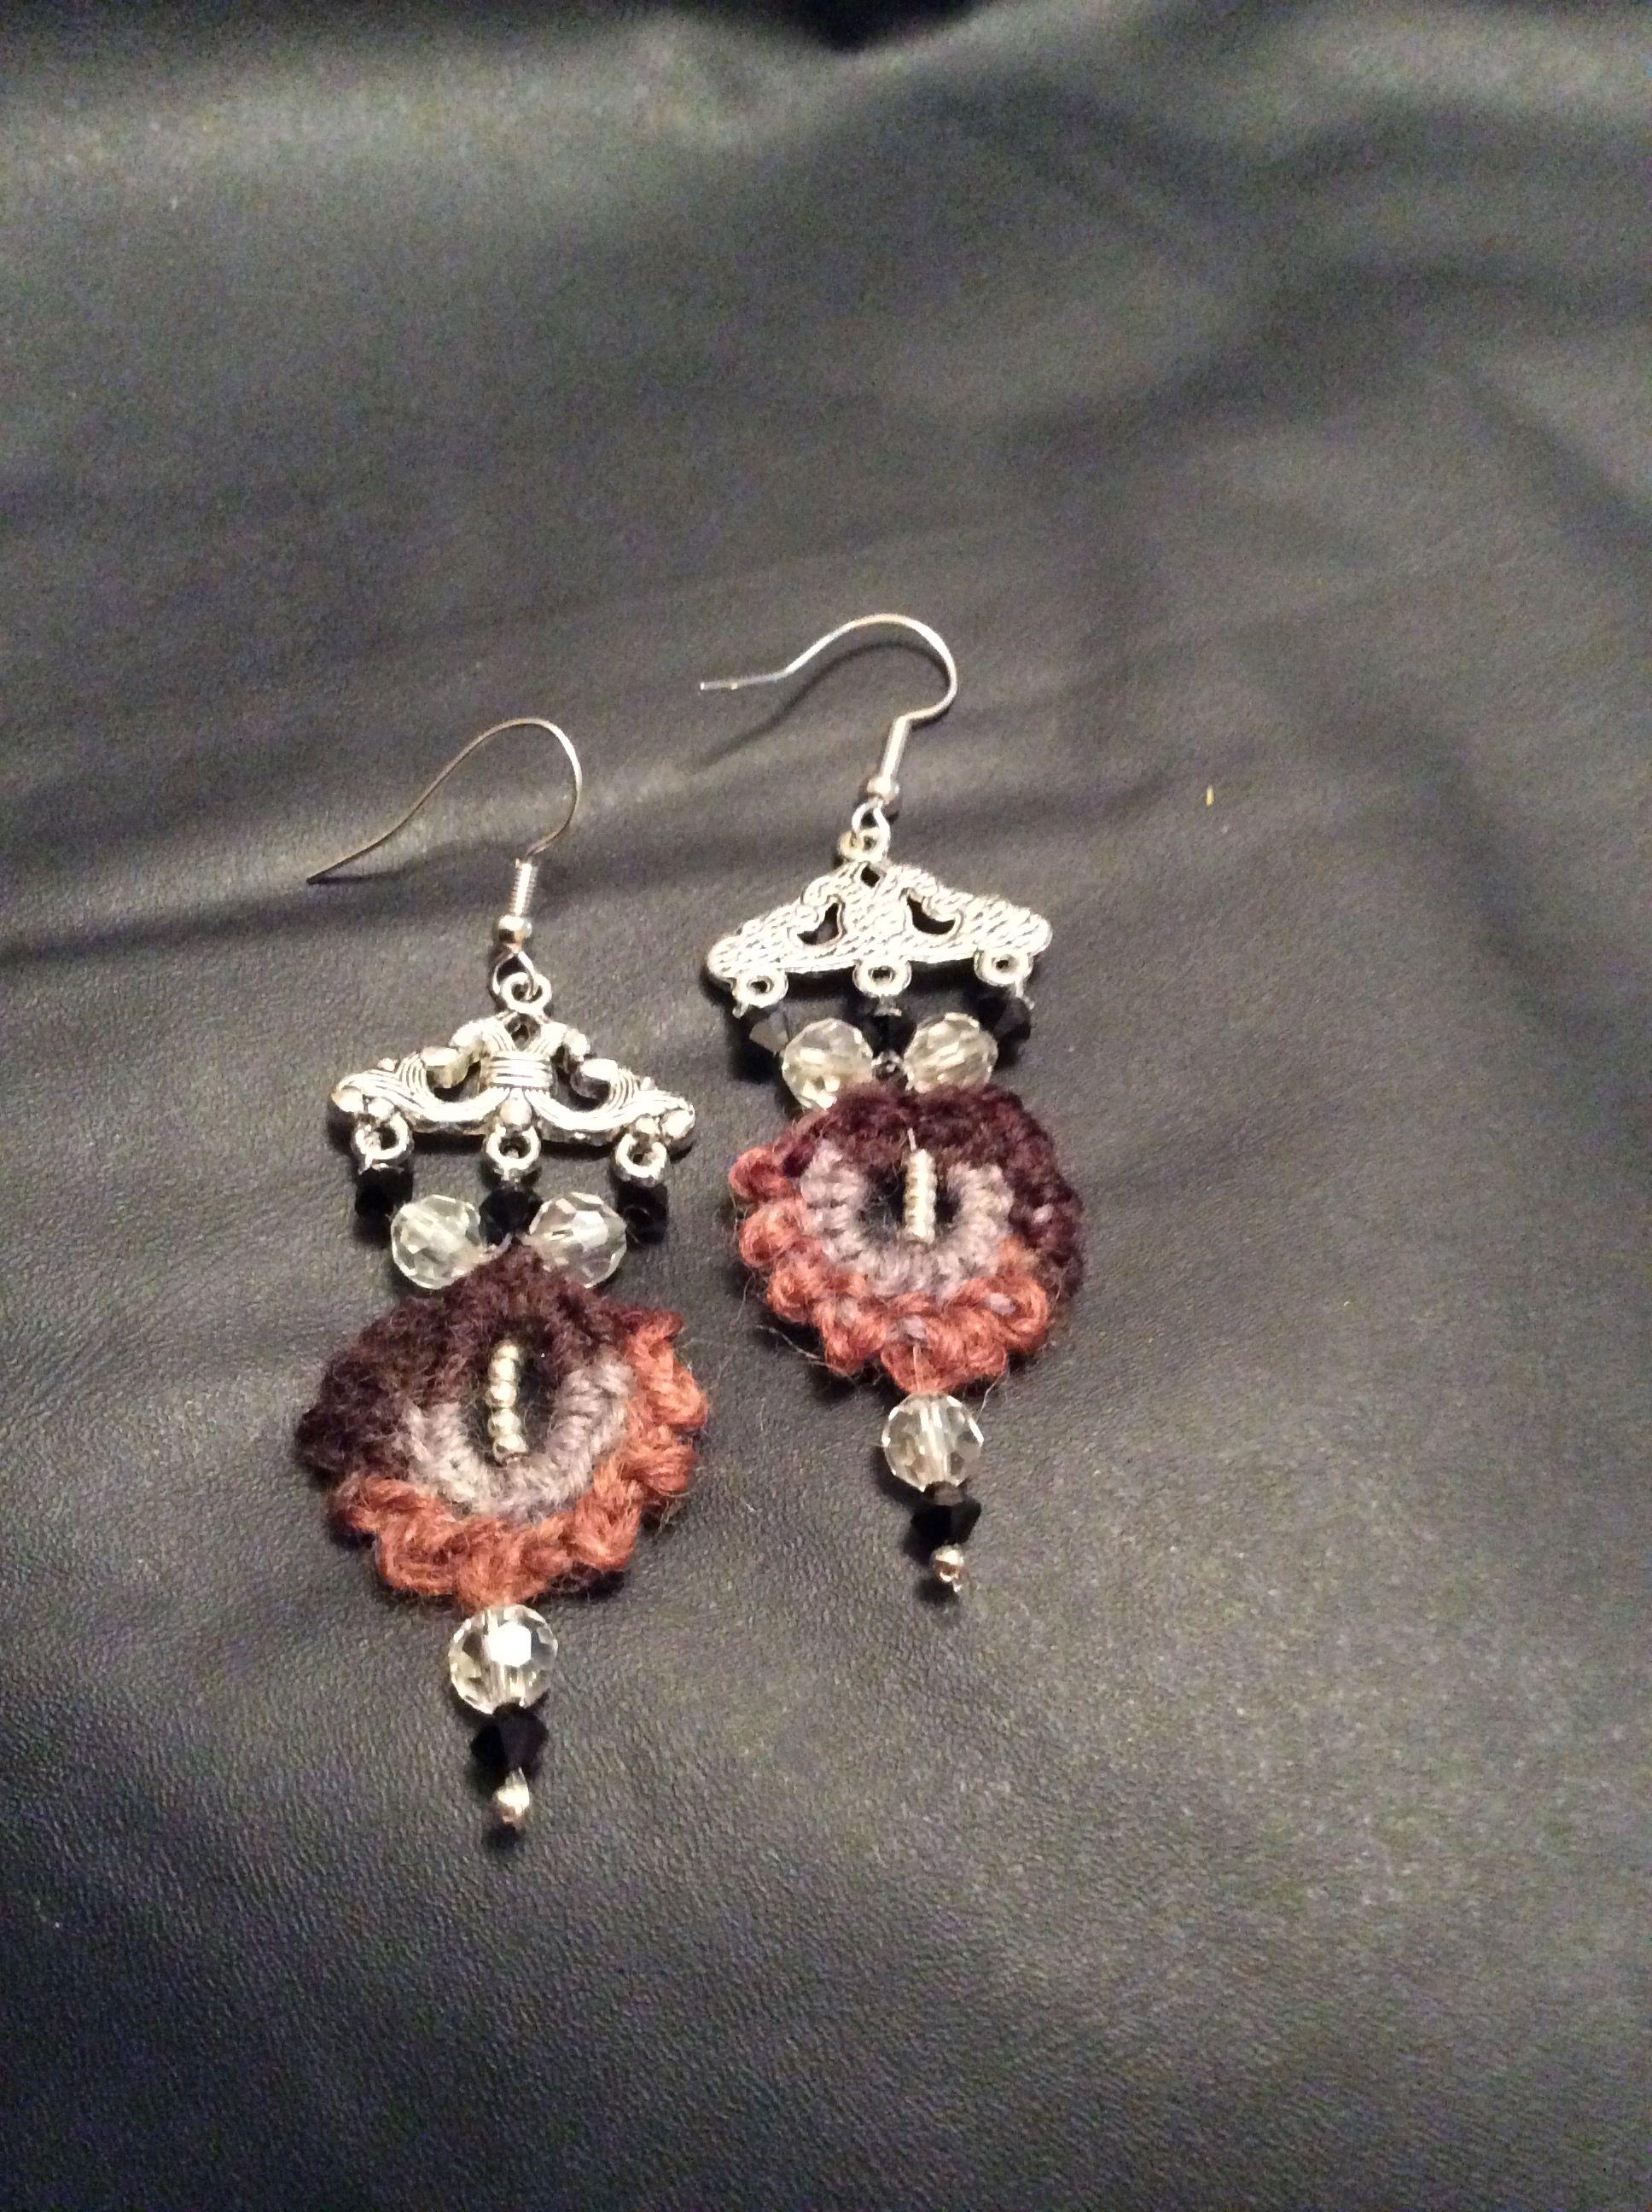 Emma's earrings. Crochet and Swarovski crystals.